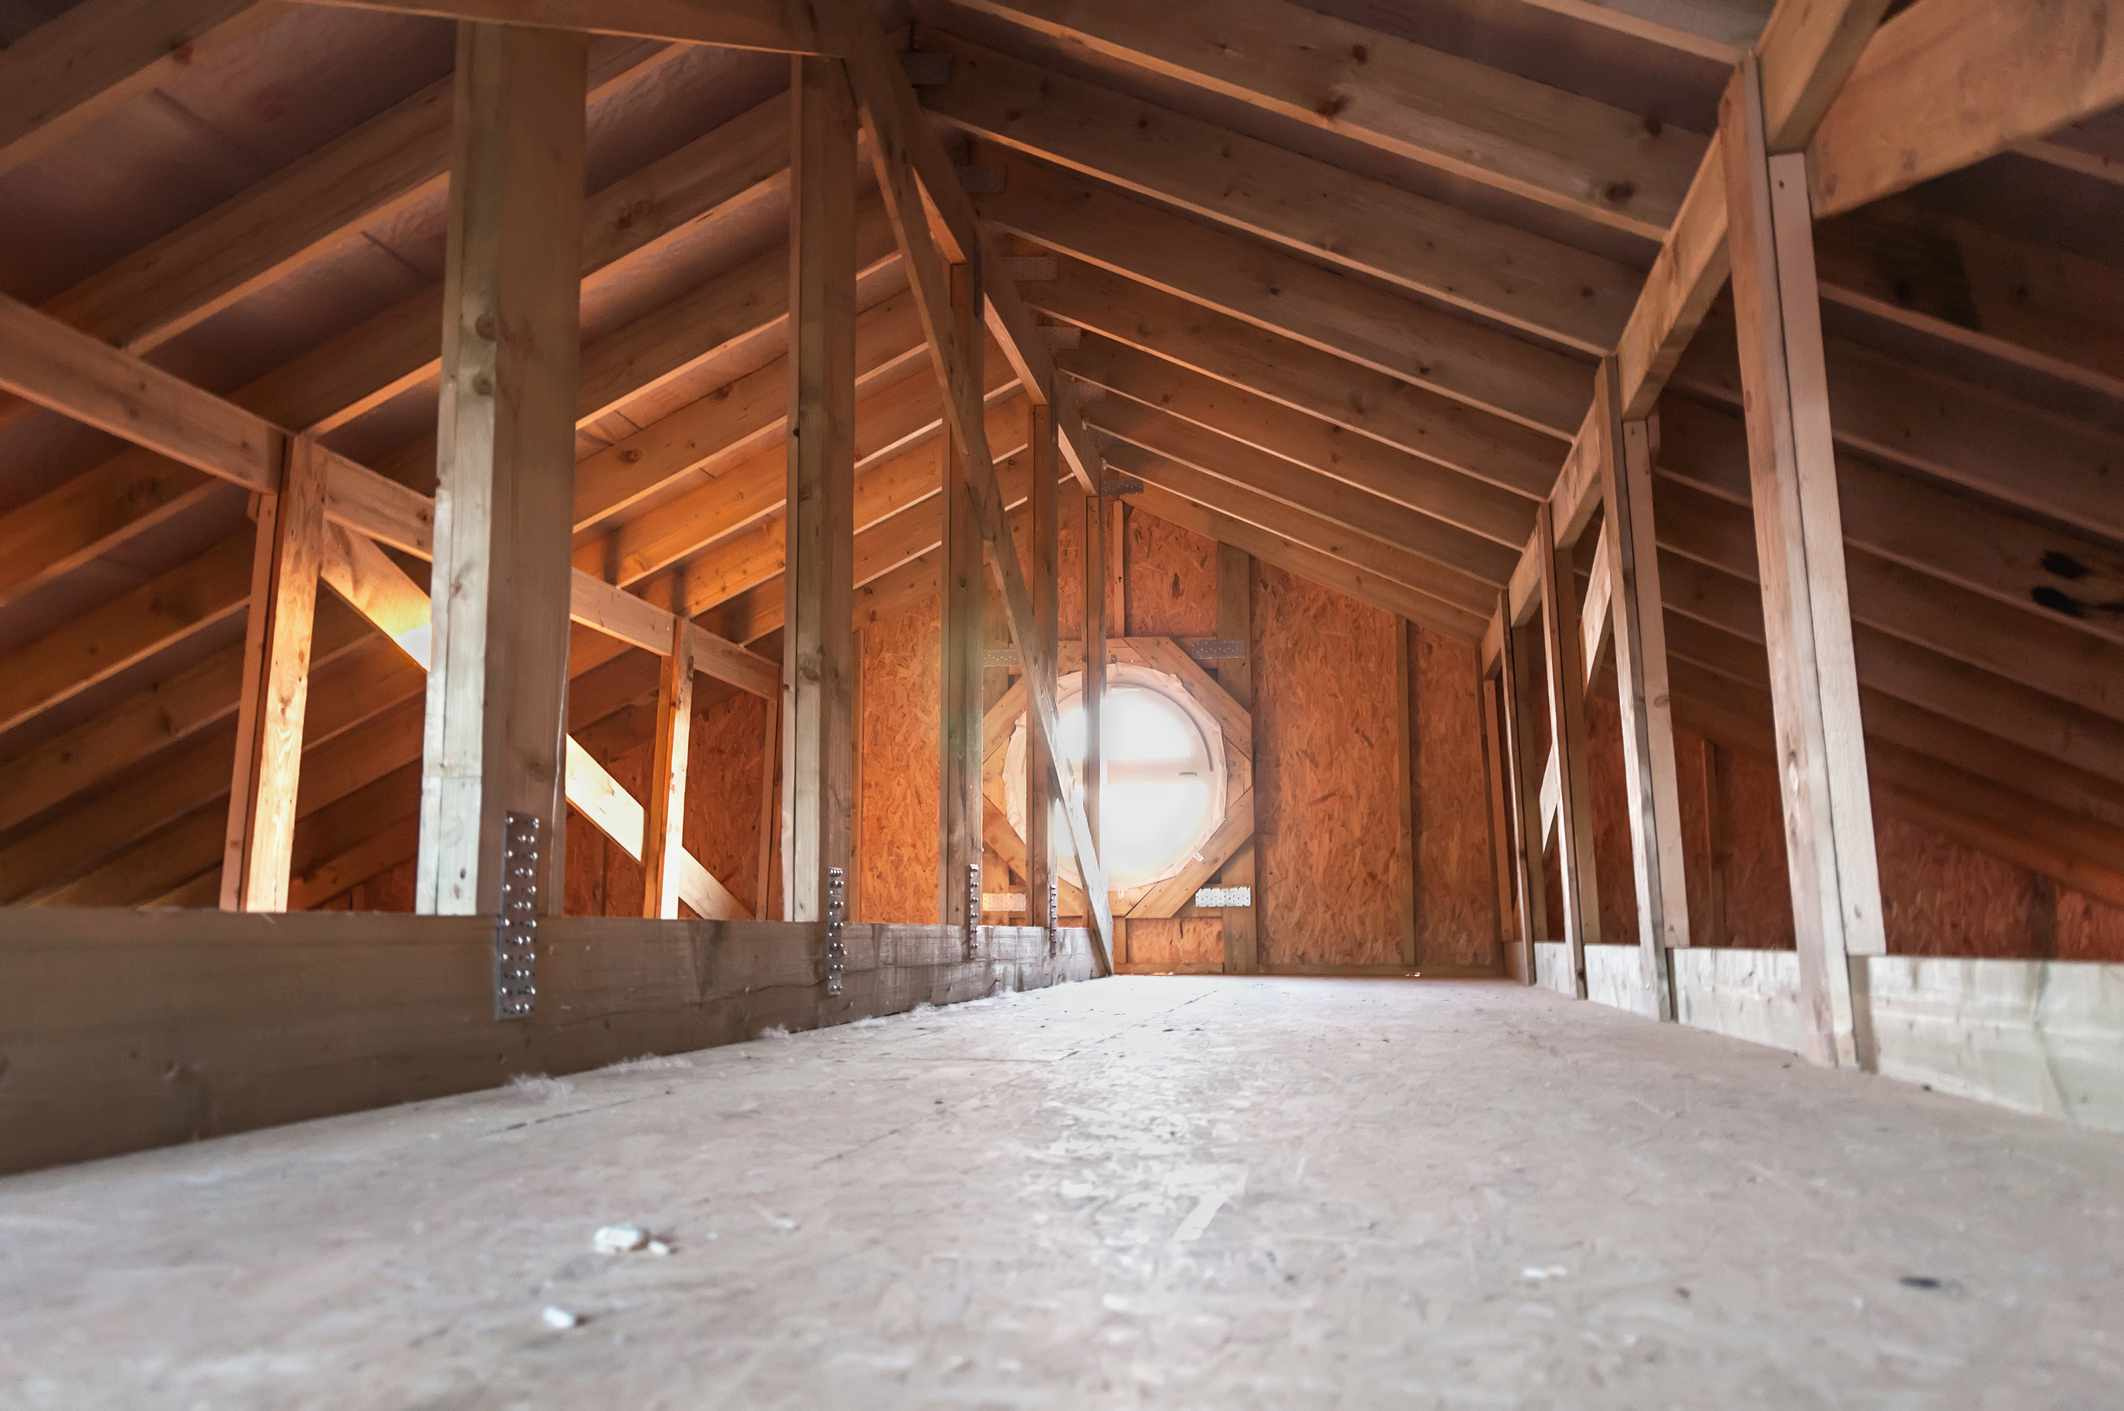 Attic rafter